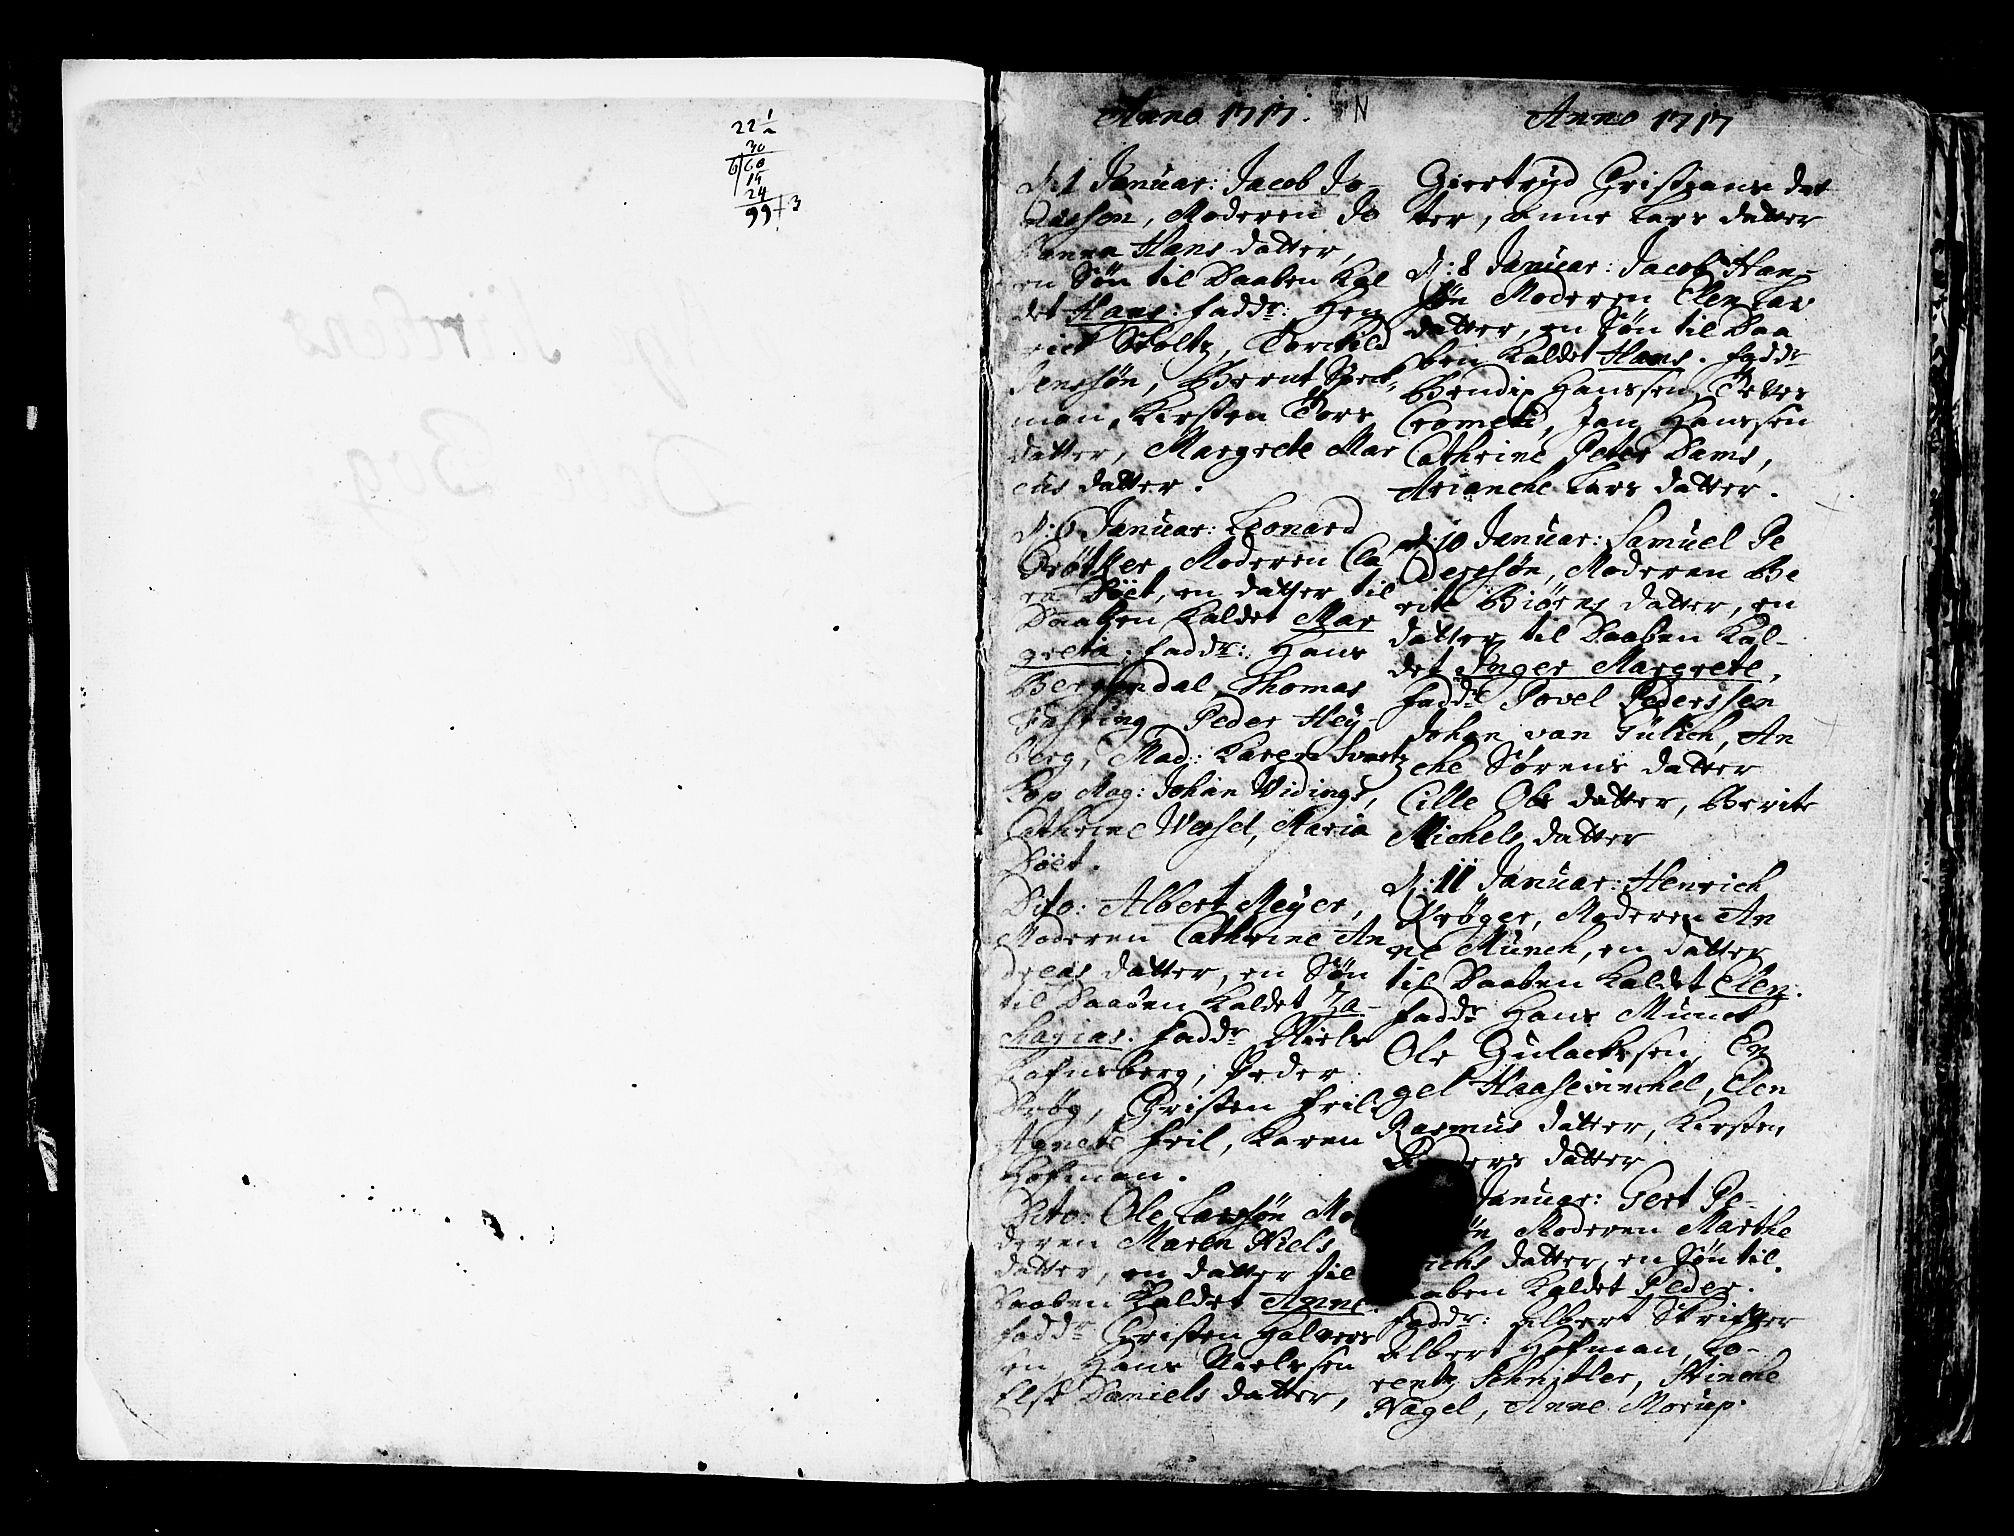 SAB, Nykirken Sokneprestembete, H/Haa: Ministerialbok nr. A 3, 1717-1764, s. 2